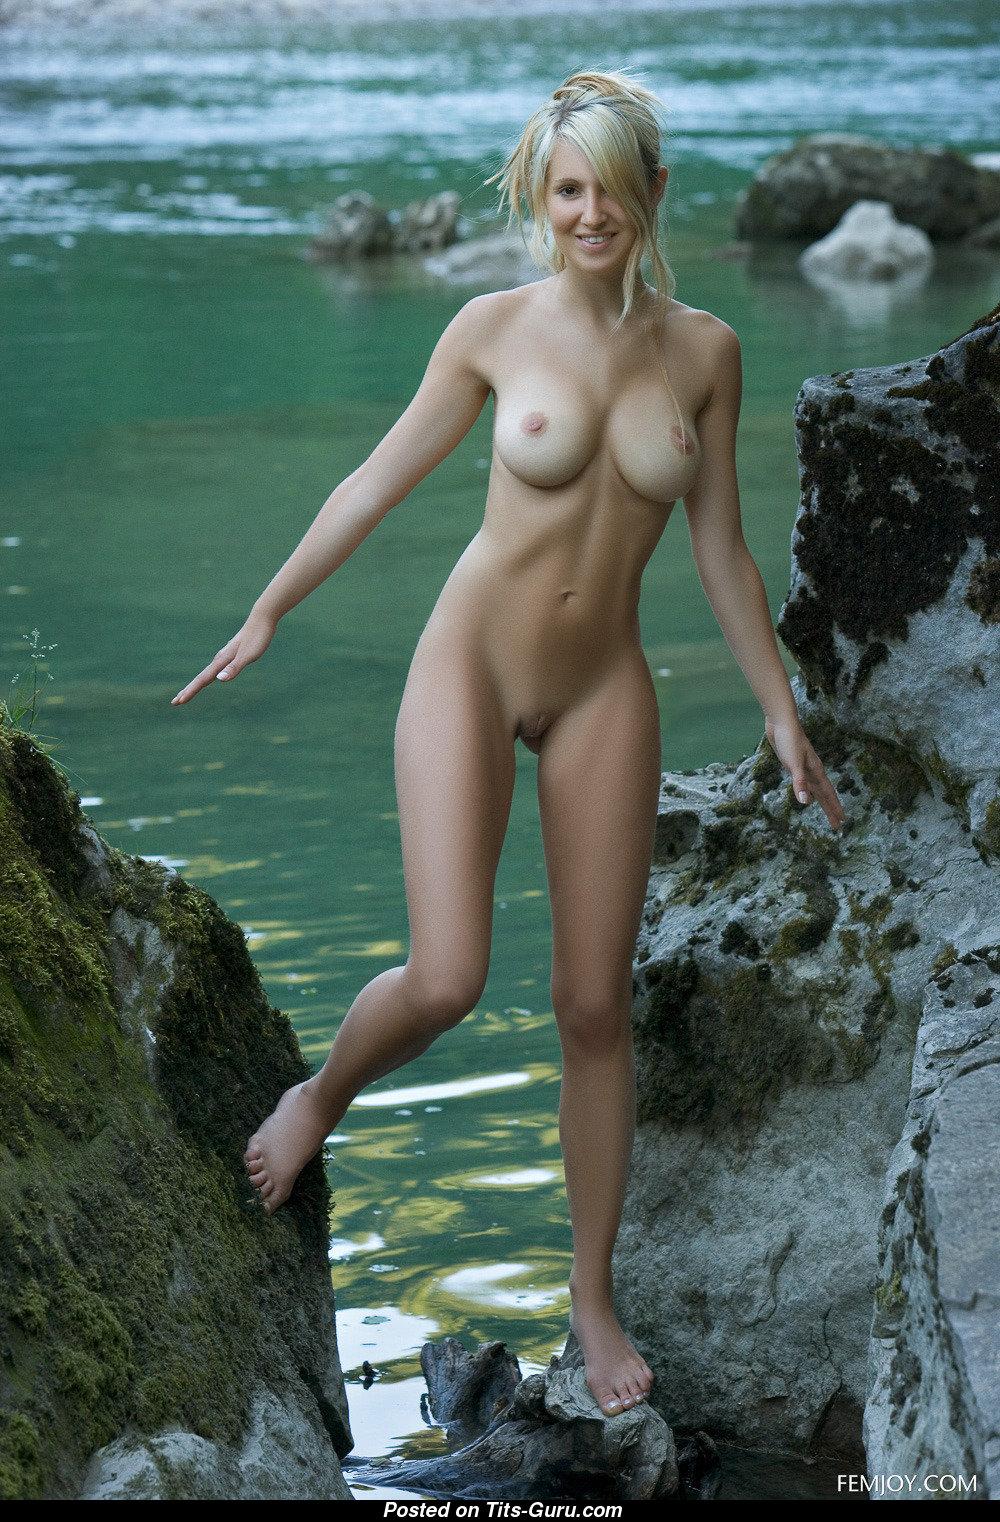 Daniela roesch nude